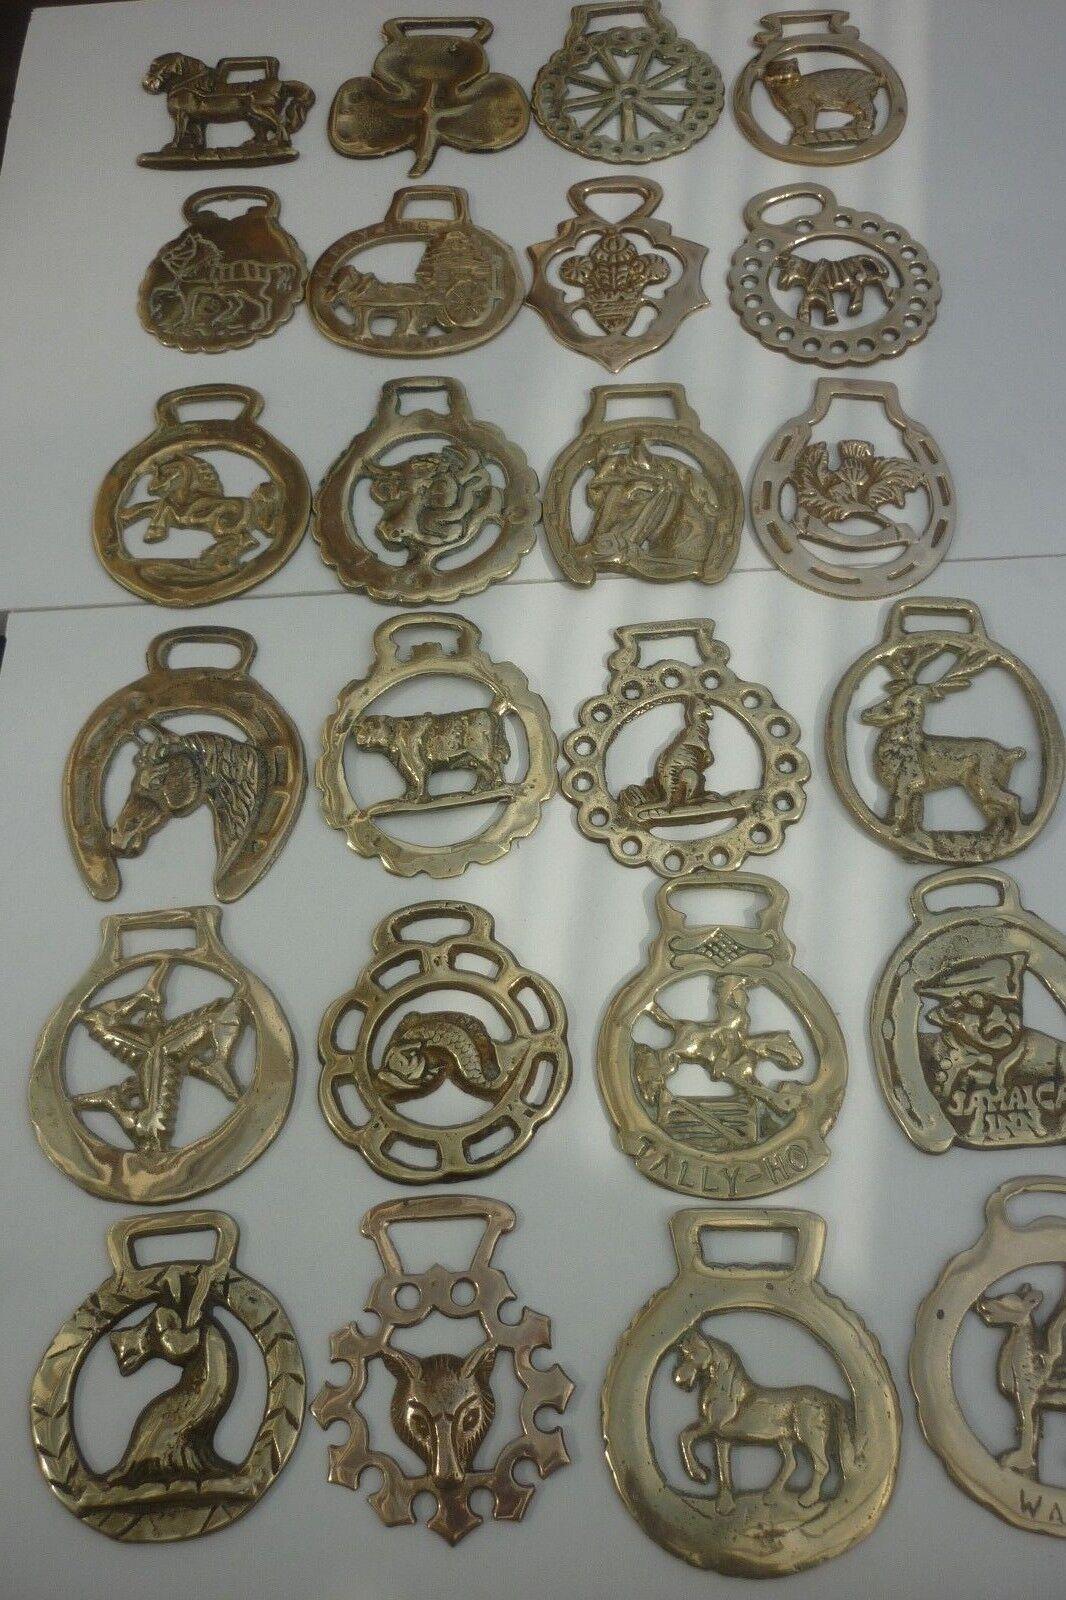 49 ASSORTED HORSE BRASSES - (8E) ~ COMBINE POST ~ DETAILS BELOW ~